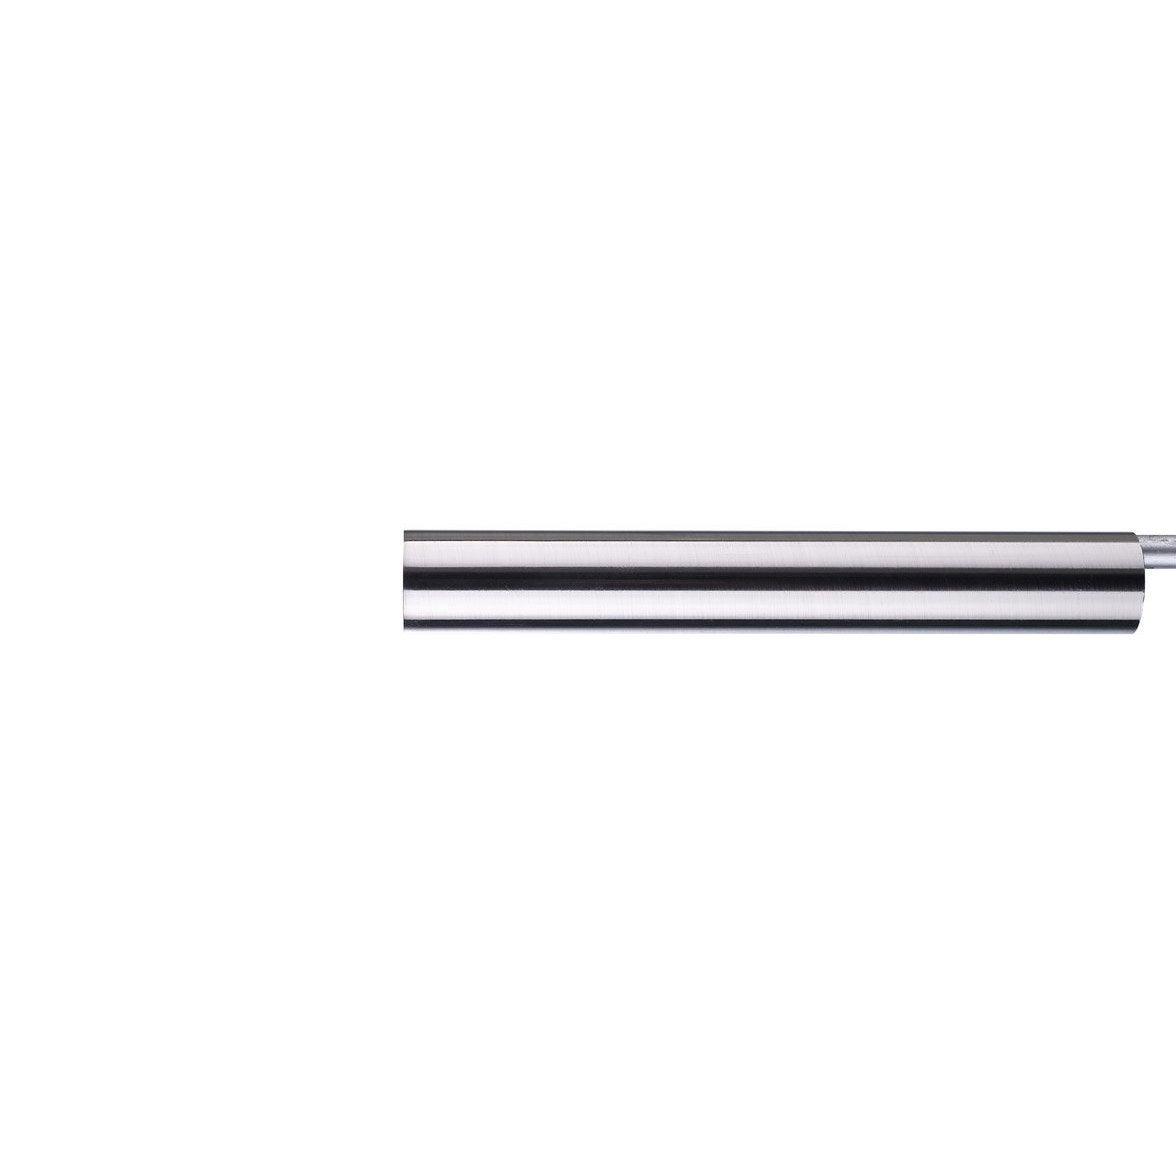 tringle rideau chic chrom bross 250 cm inspire leroy merlin. Black Bedroom Furniture Sets. Home Design Ideas